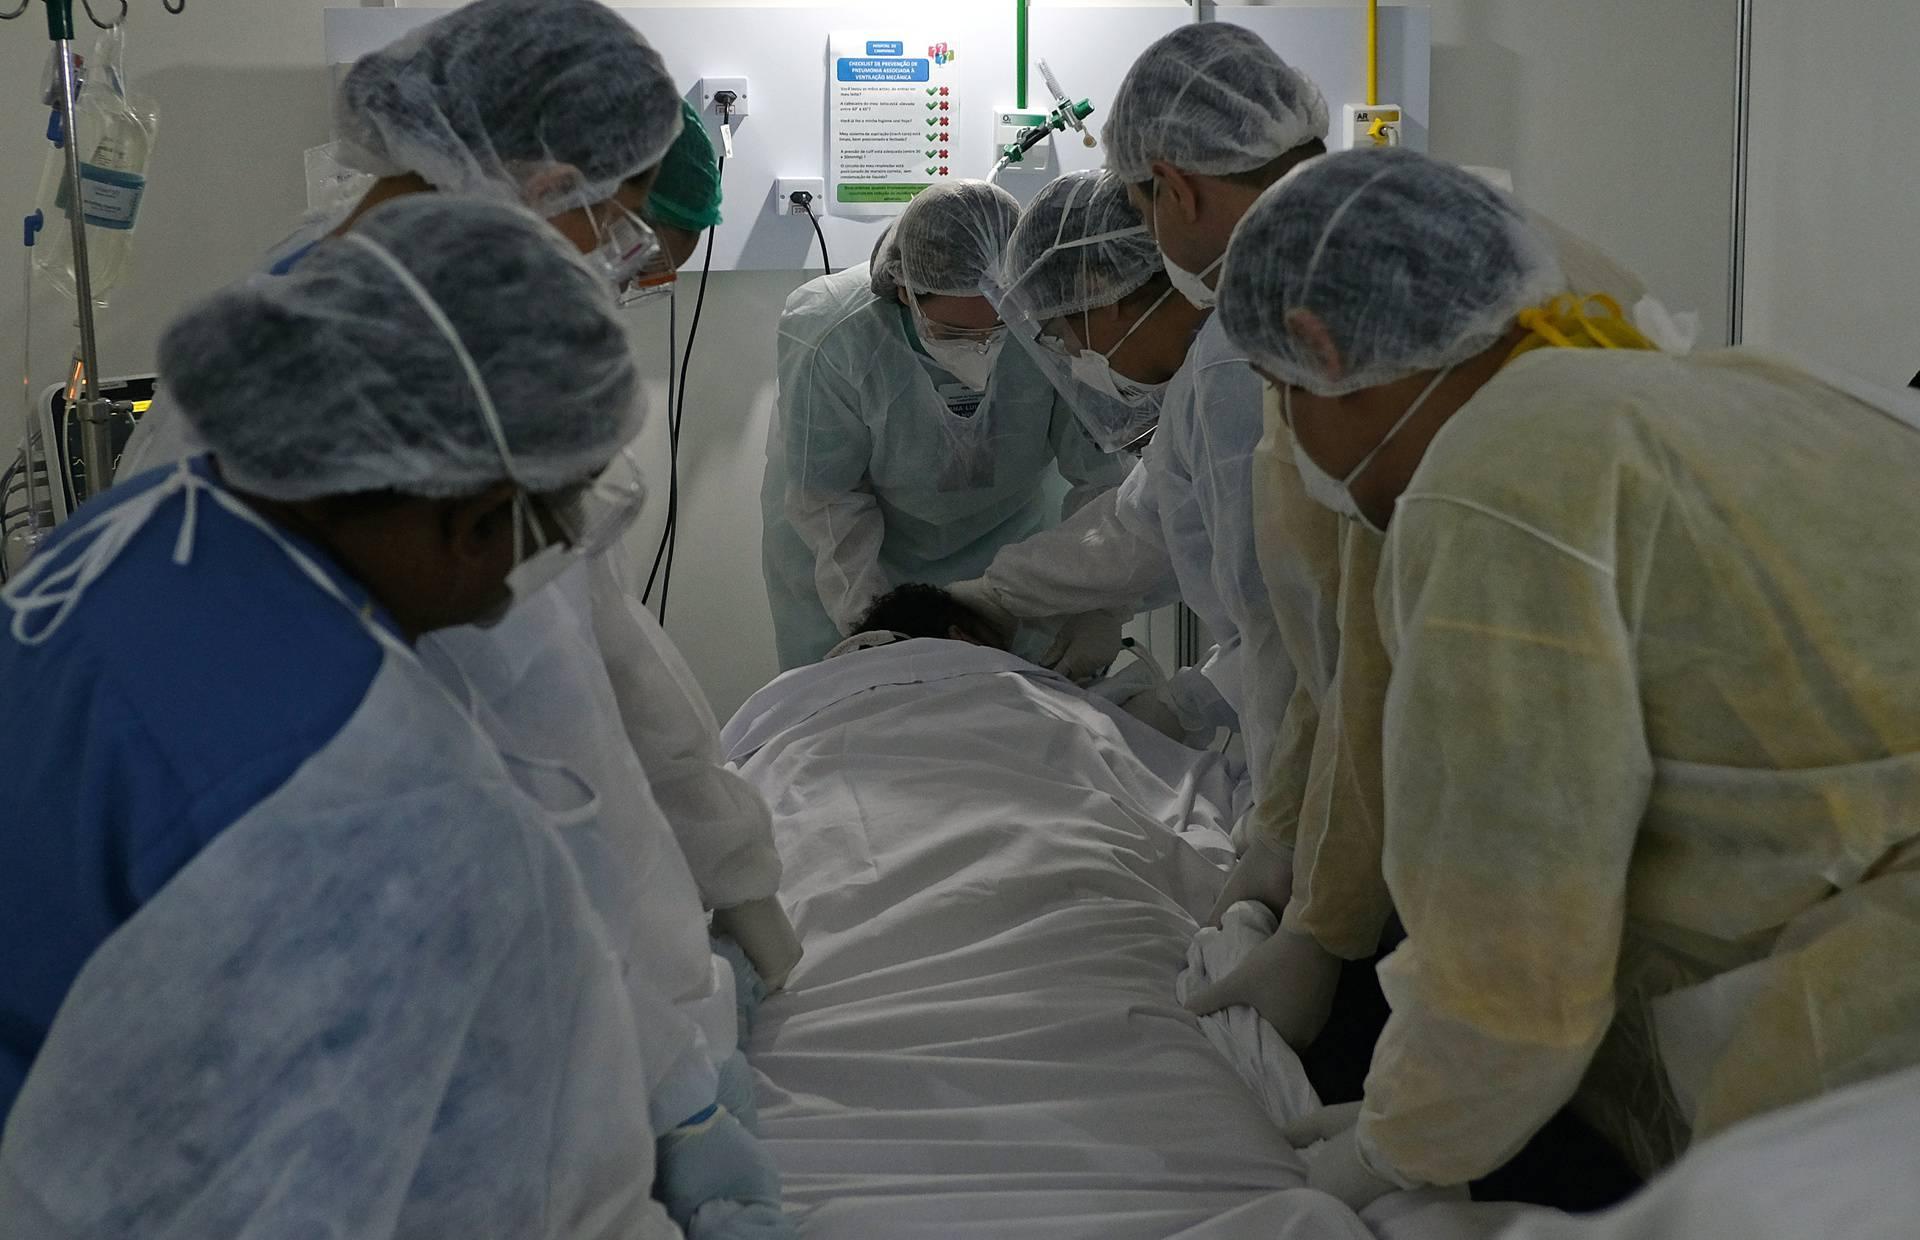 Outbreak of the coronavirus disease (COVID-19) in Rio de Janeiro